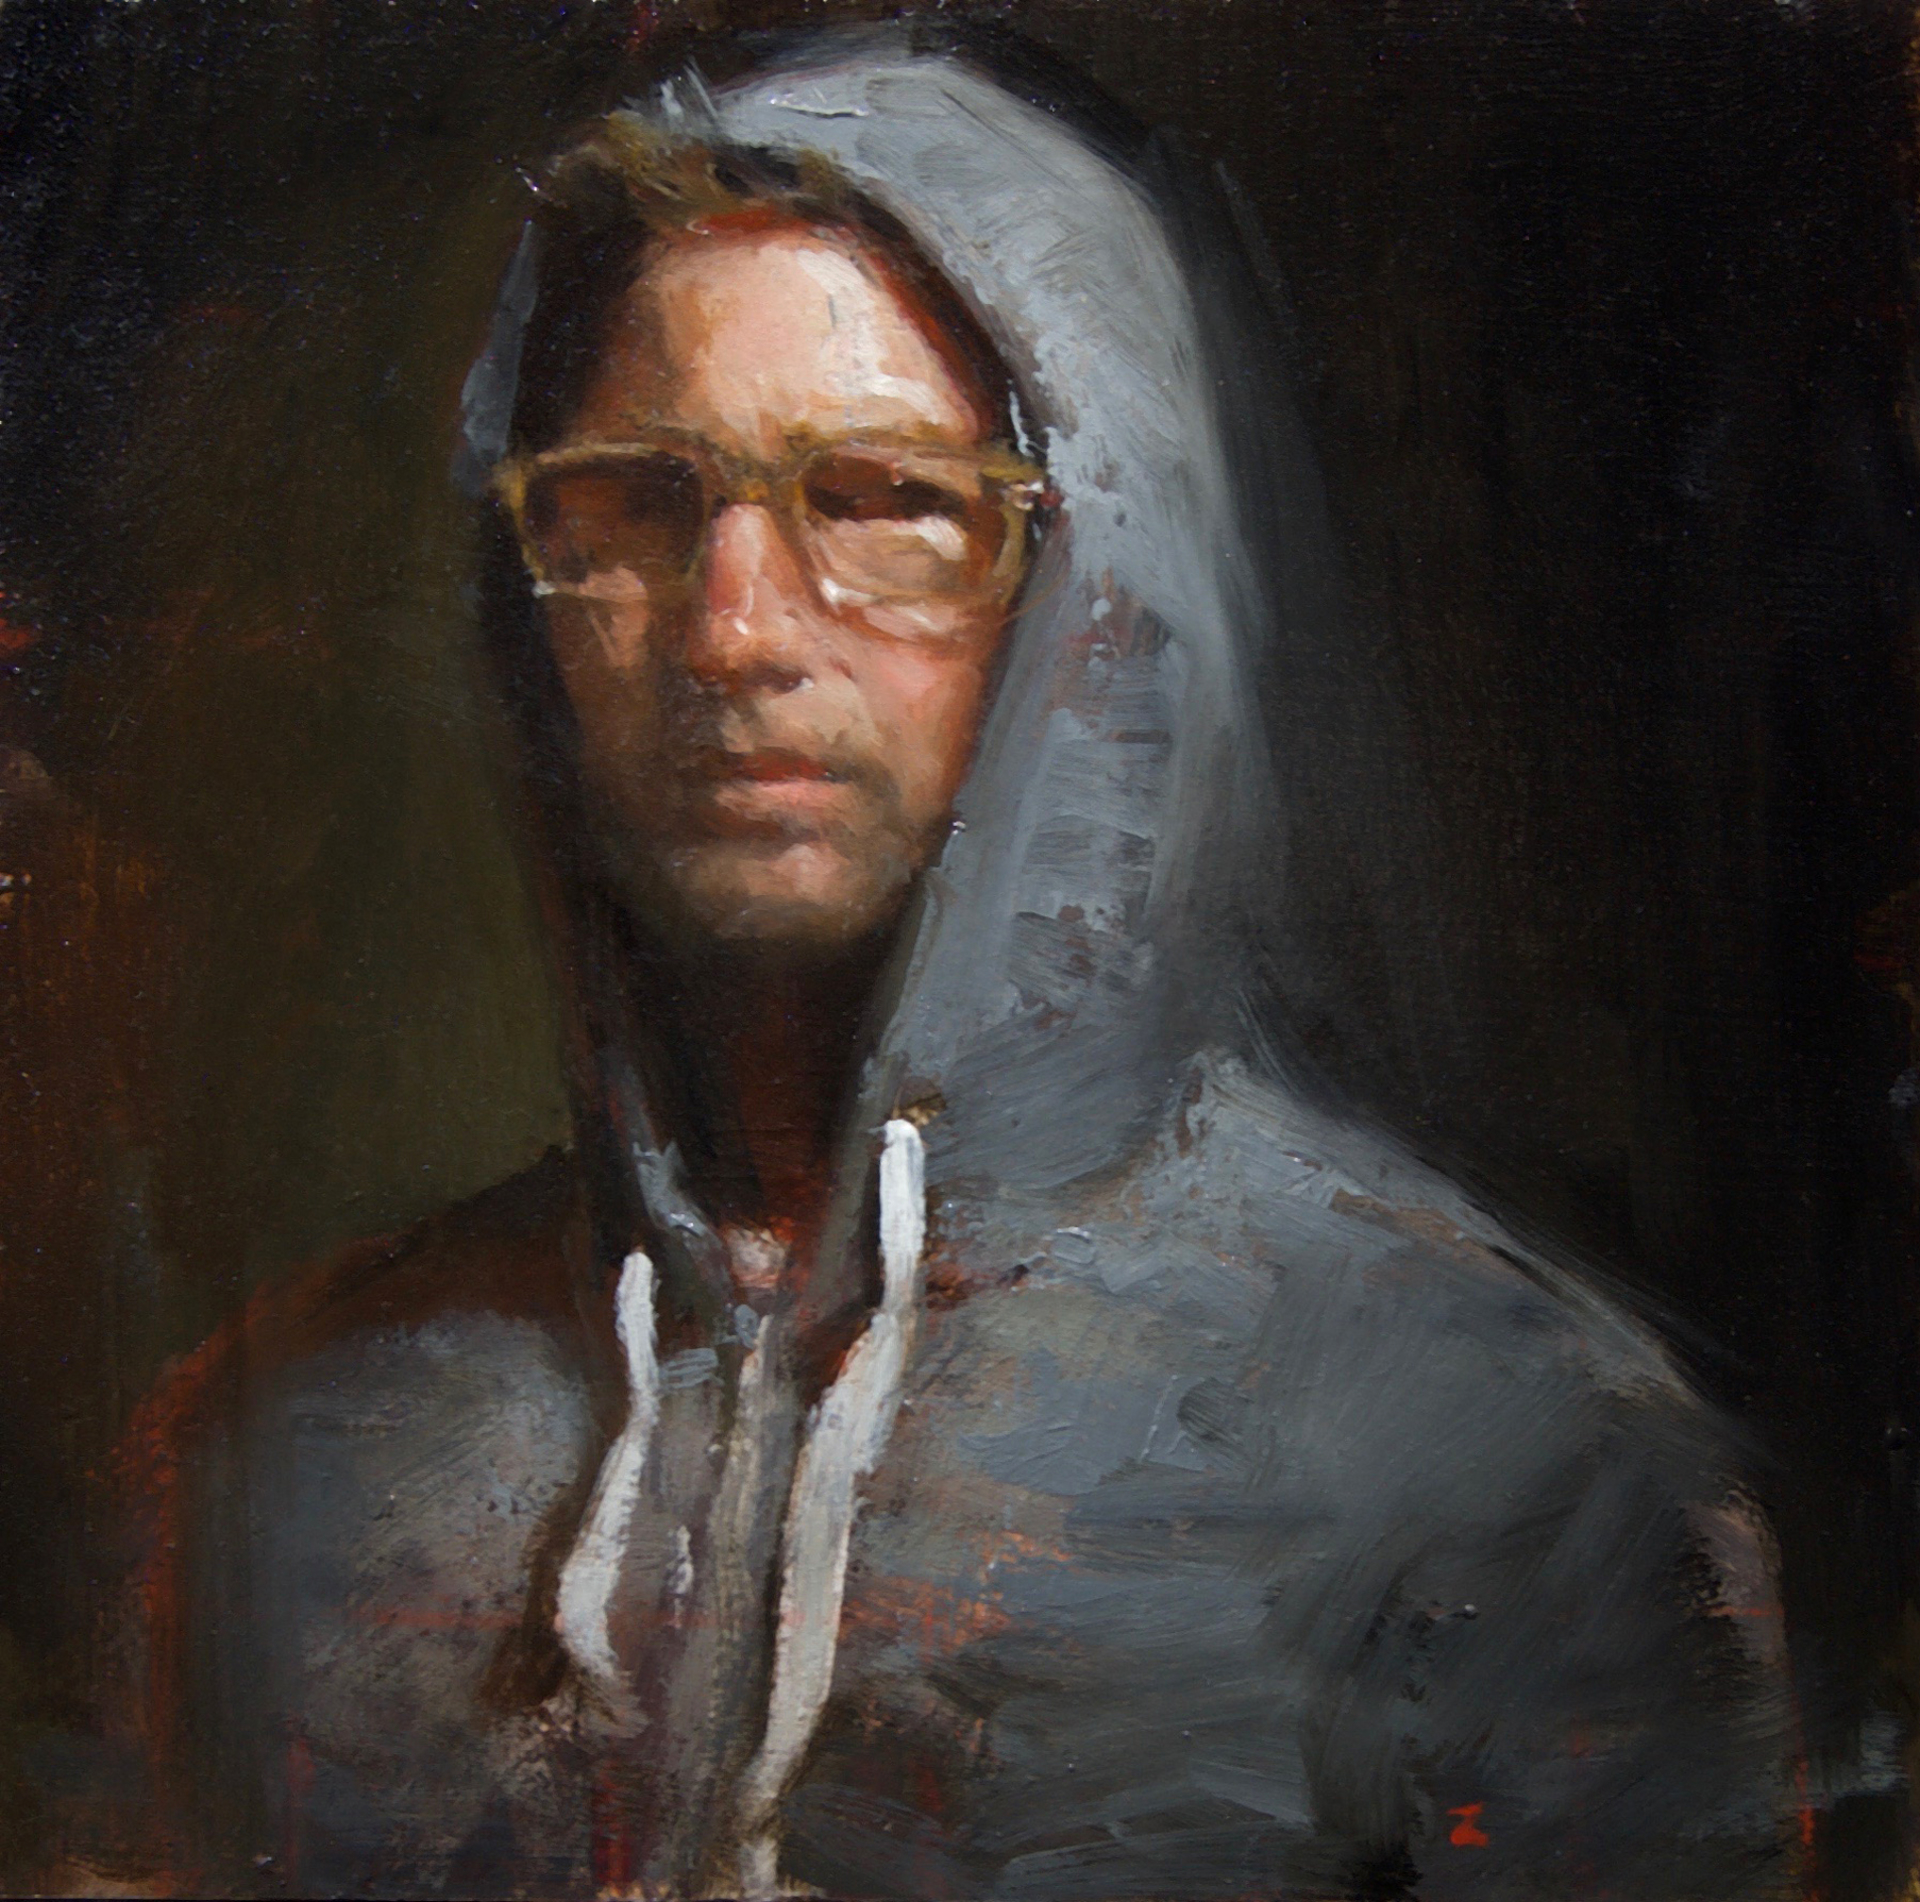 SP 18 by Zack Zdrale